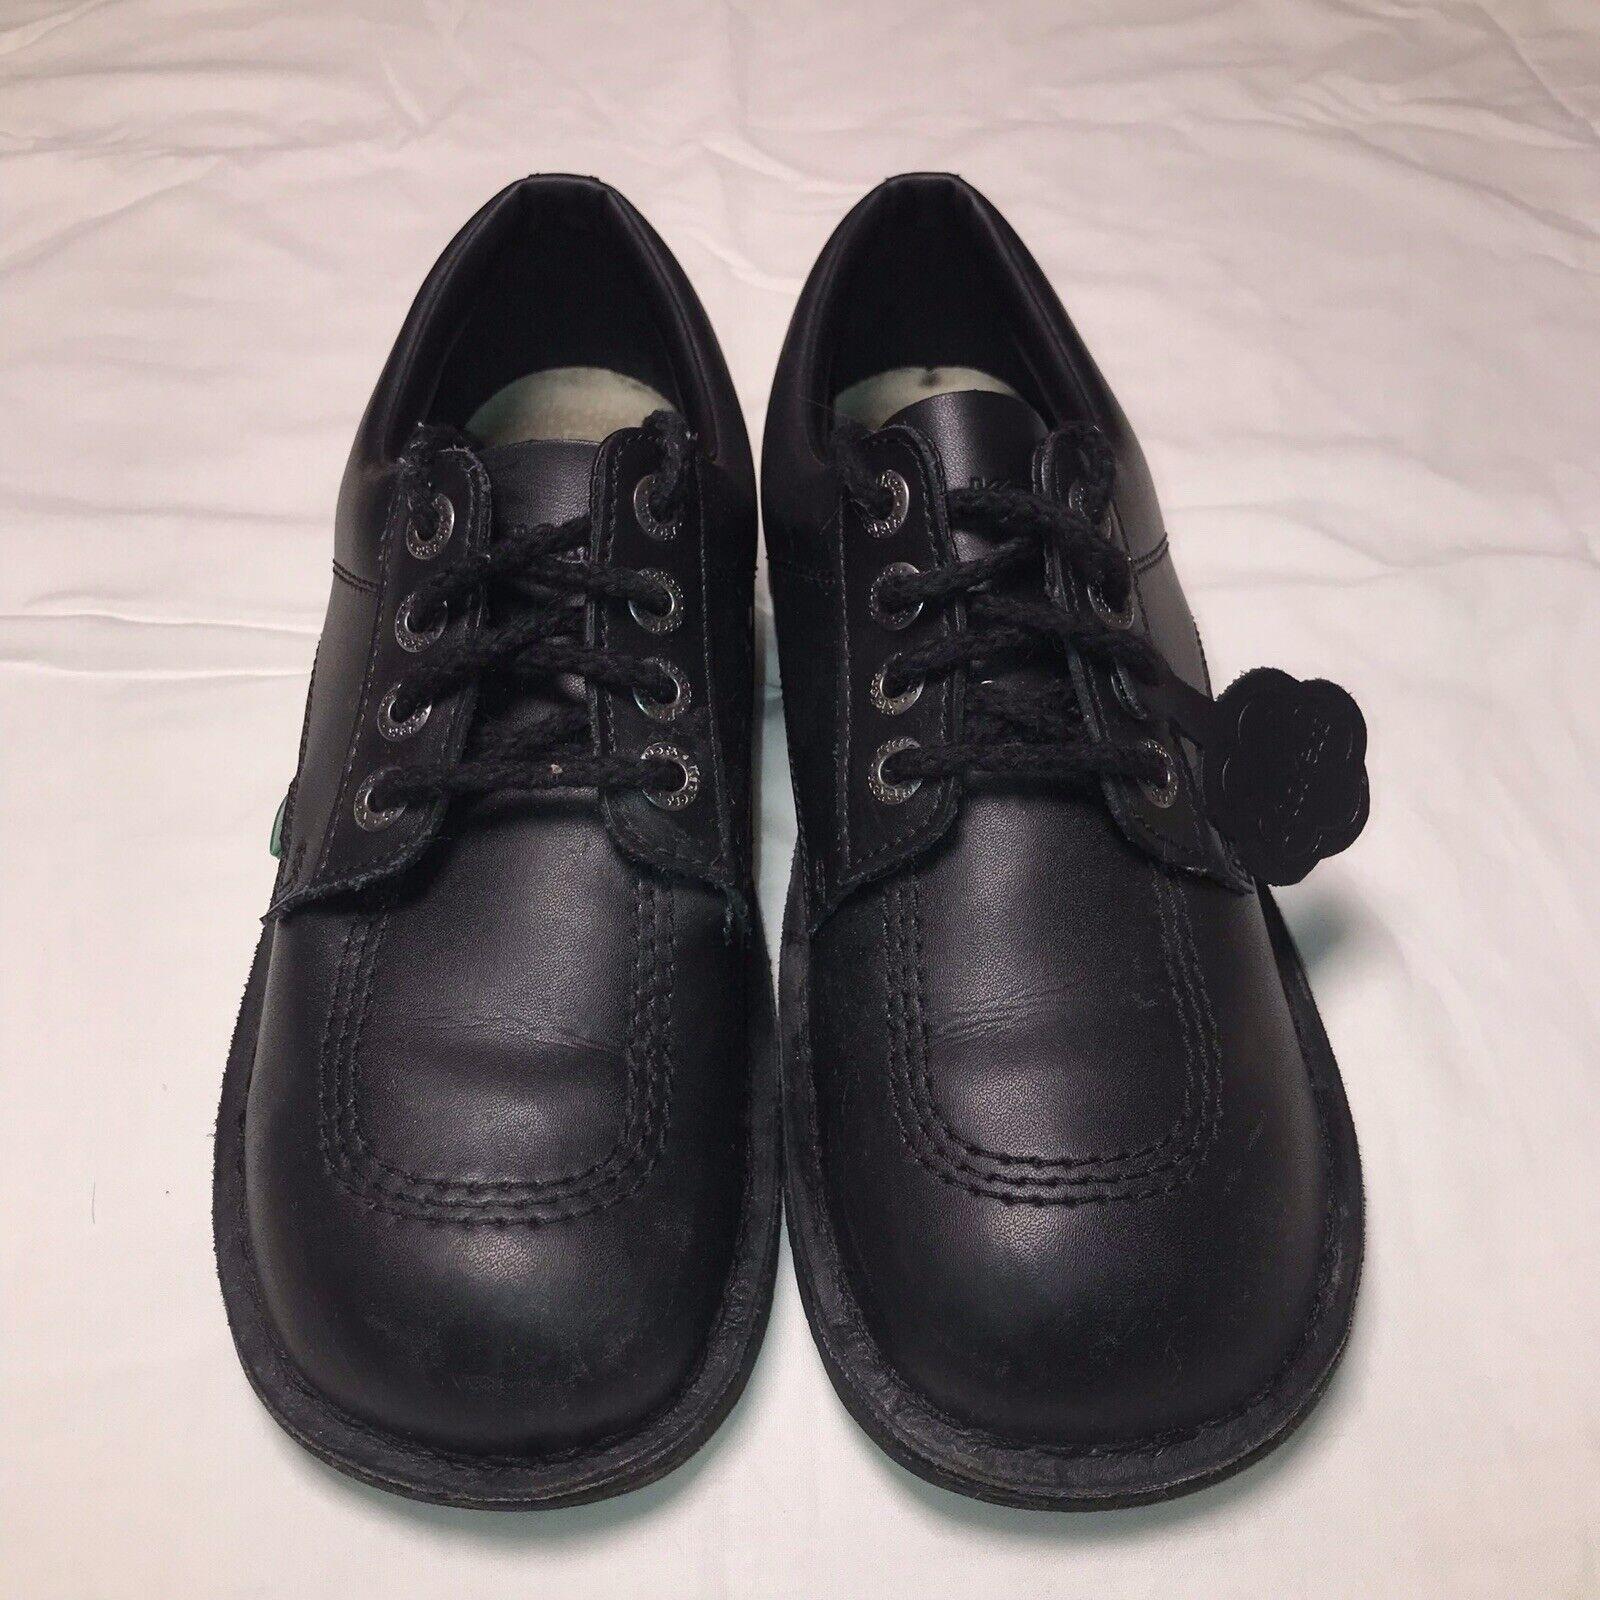 Kickers Kick Lo Core Lace-Up Shoes, Size 8UK - Black